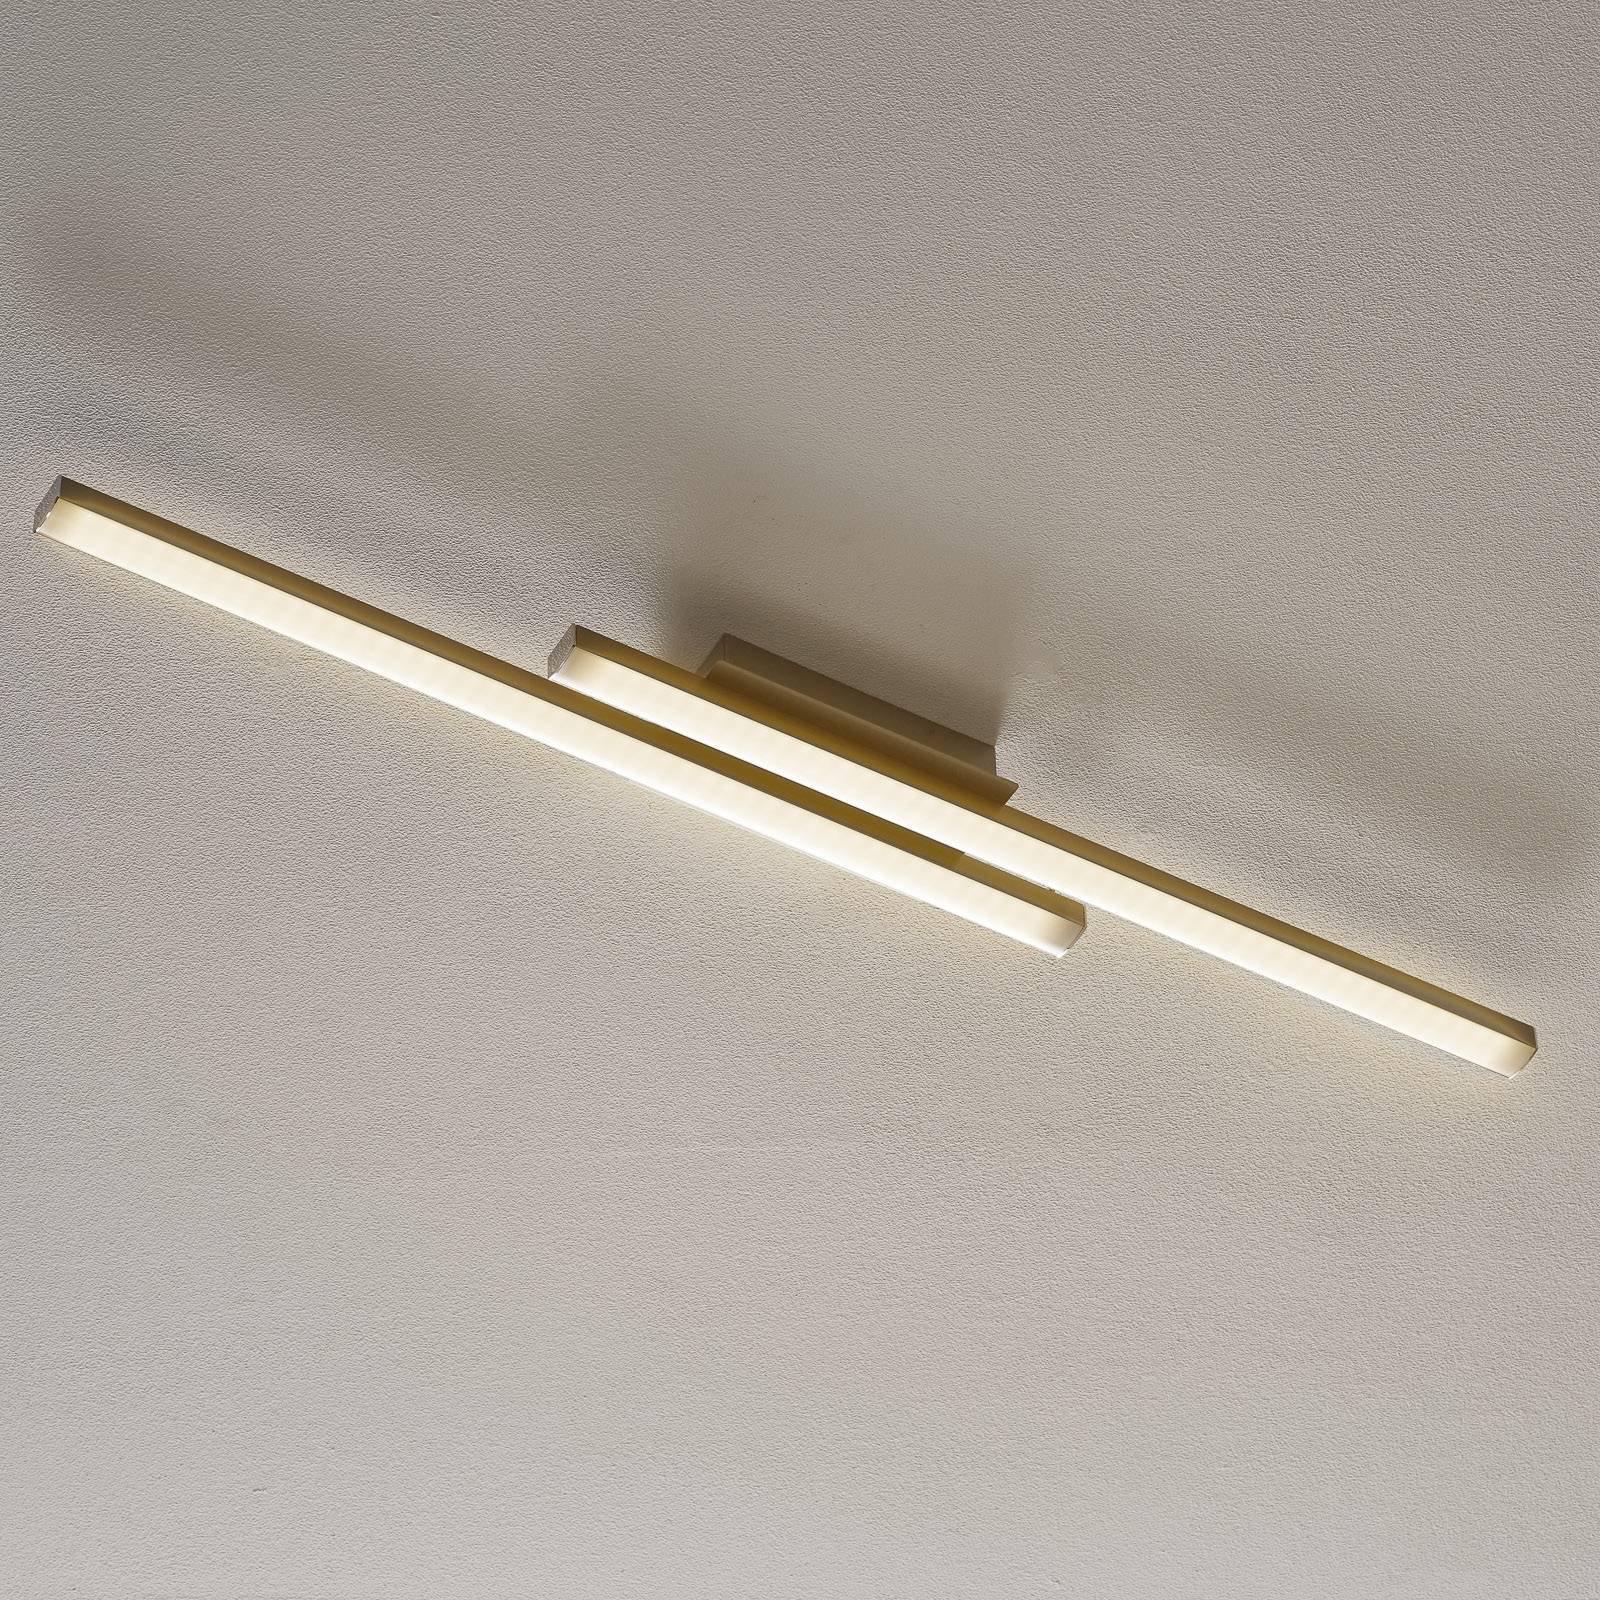 EGLO connect Fraioli-C LED-taklampe rettformet